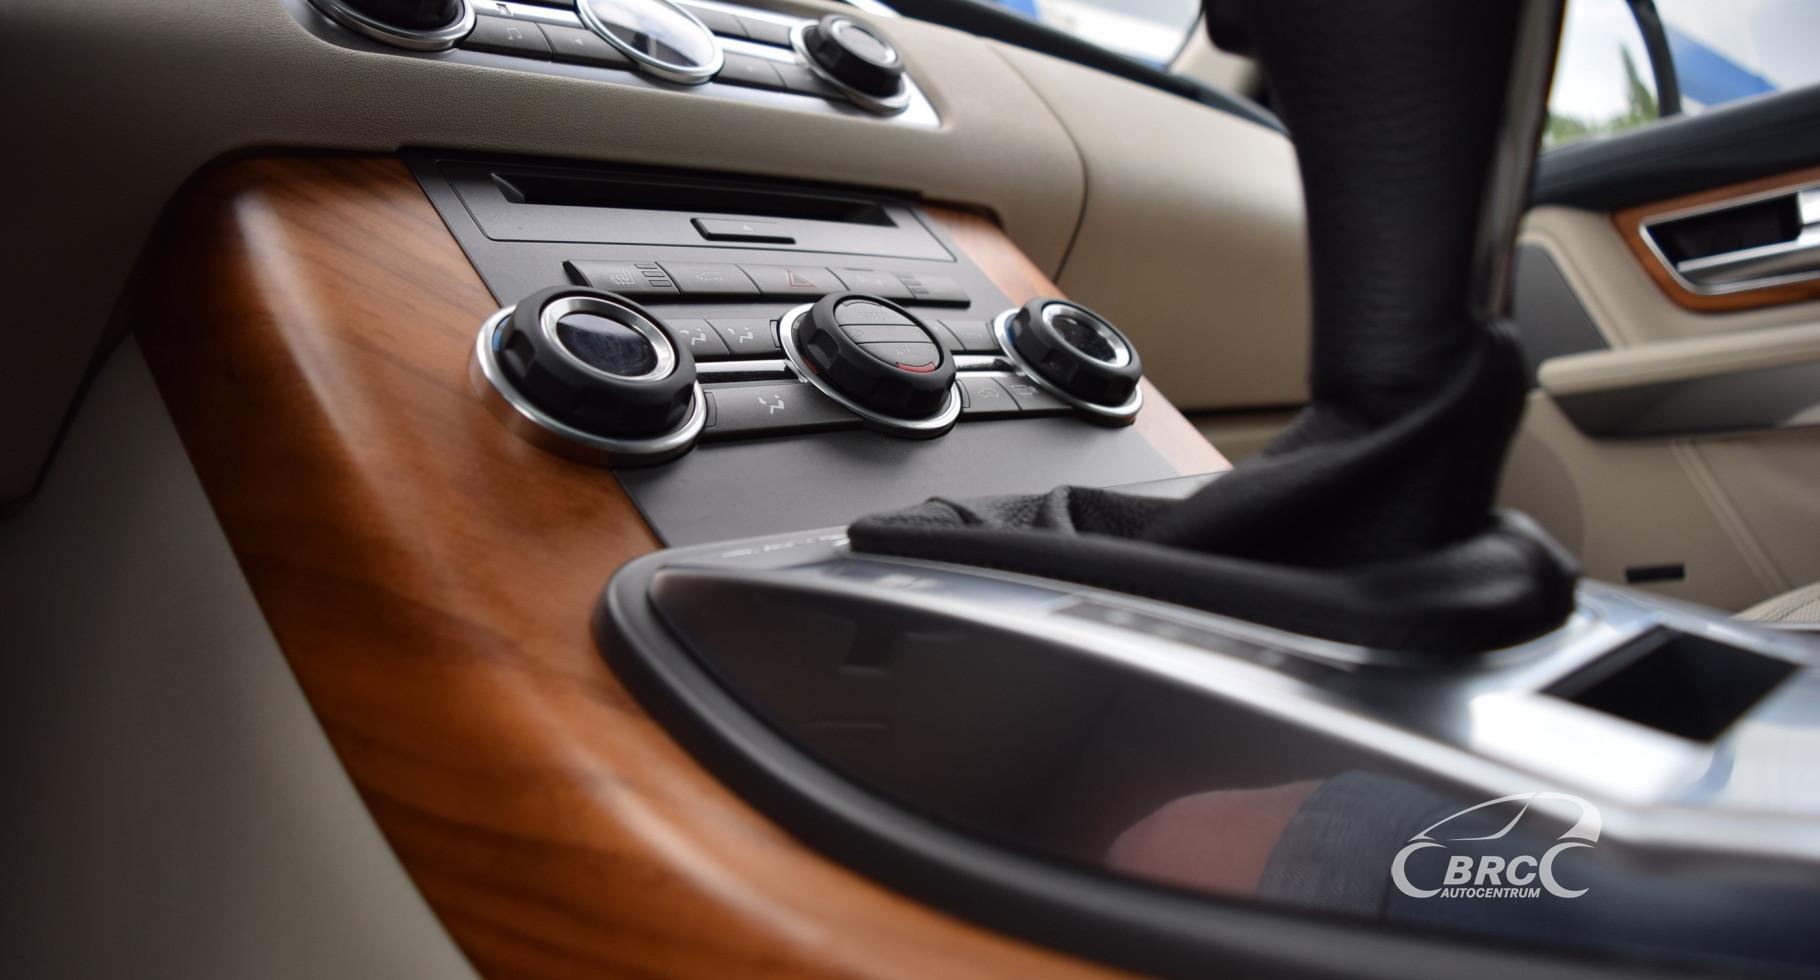 Land-Rover Range Rover Sport HSE Luxury